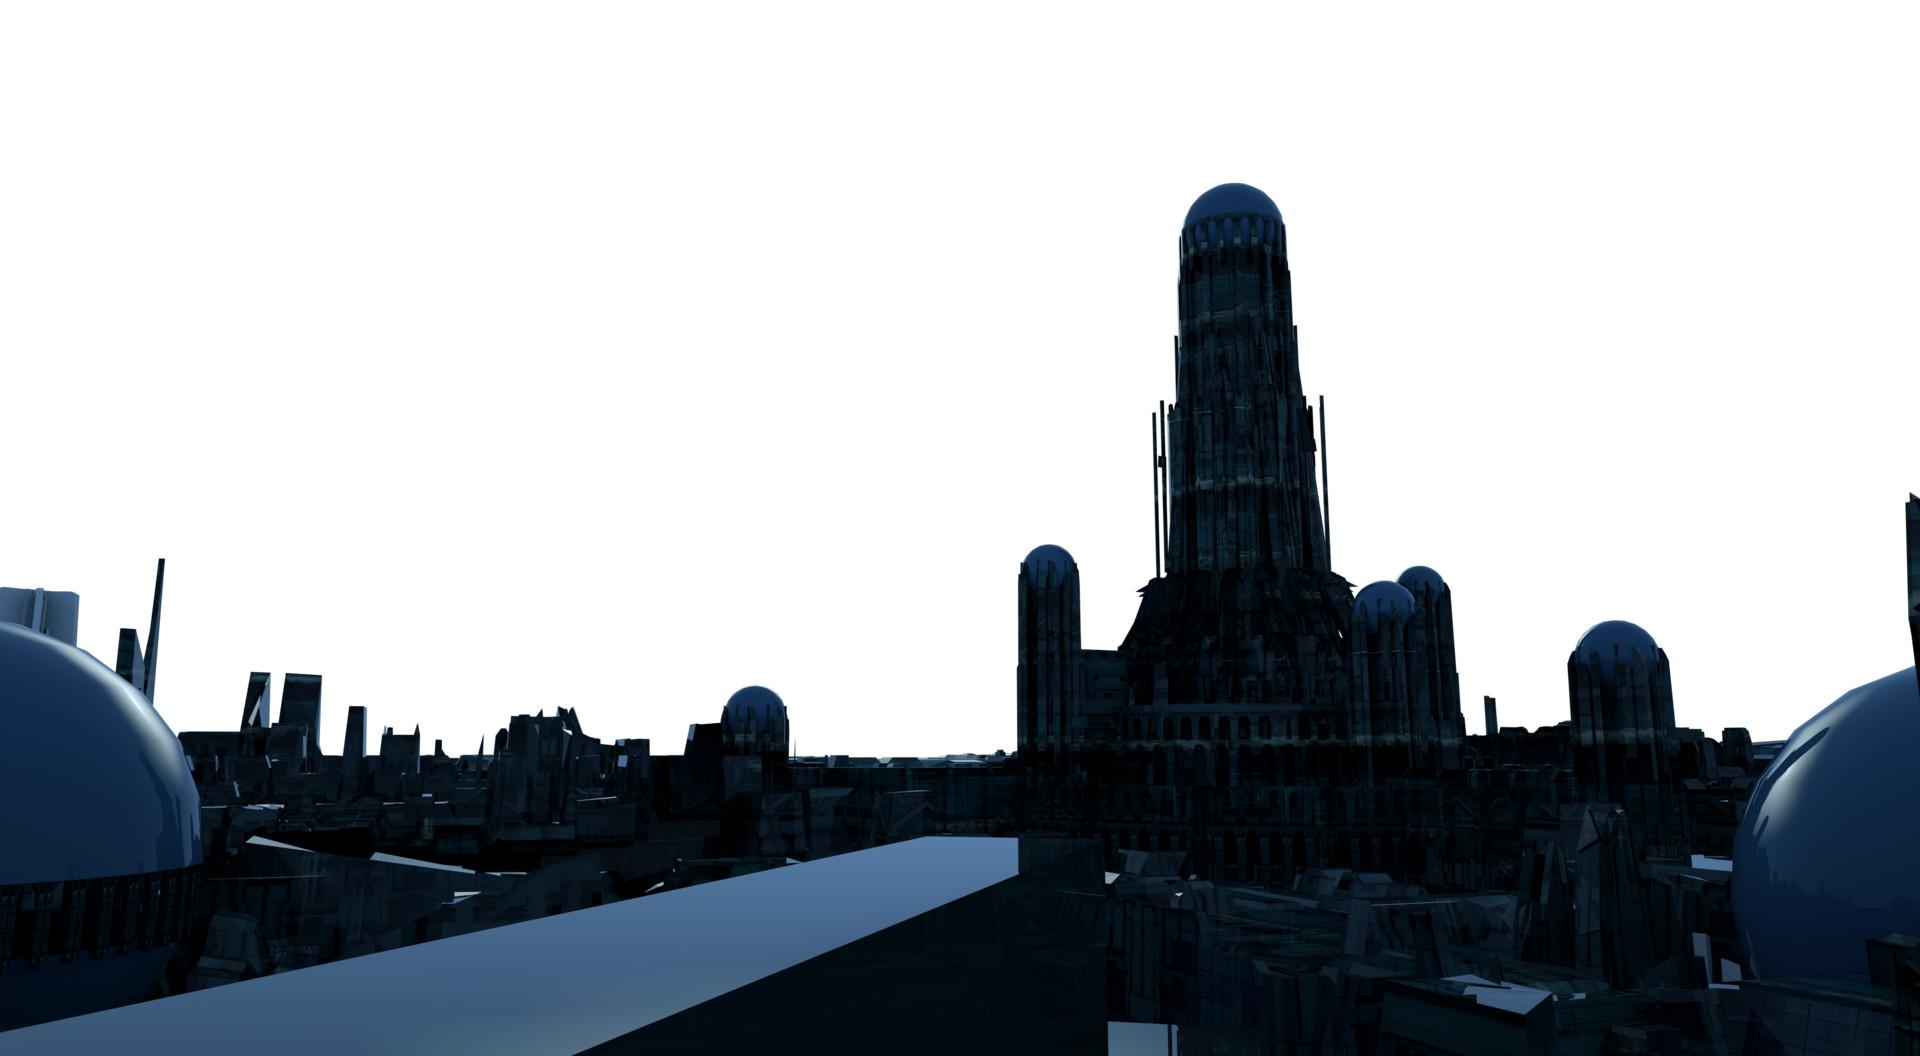 Leon tukker city6 0001